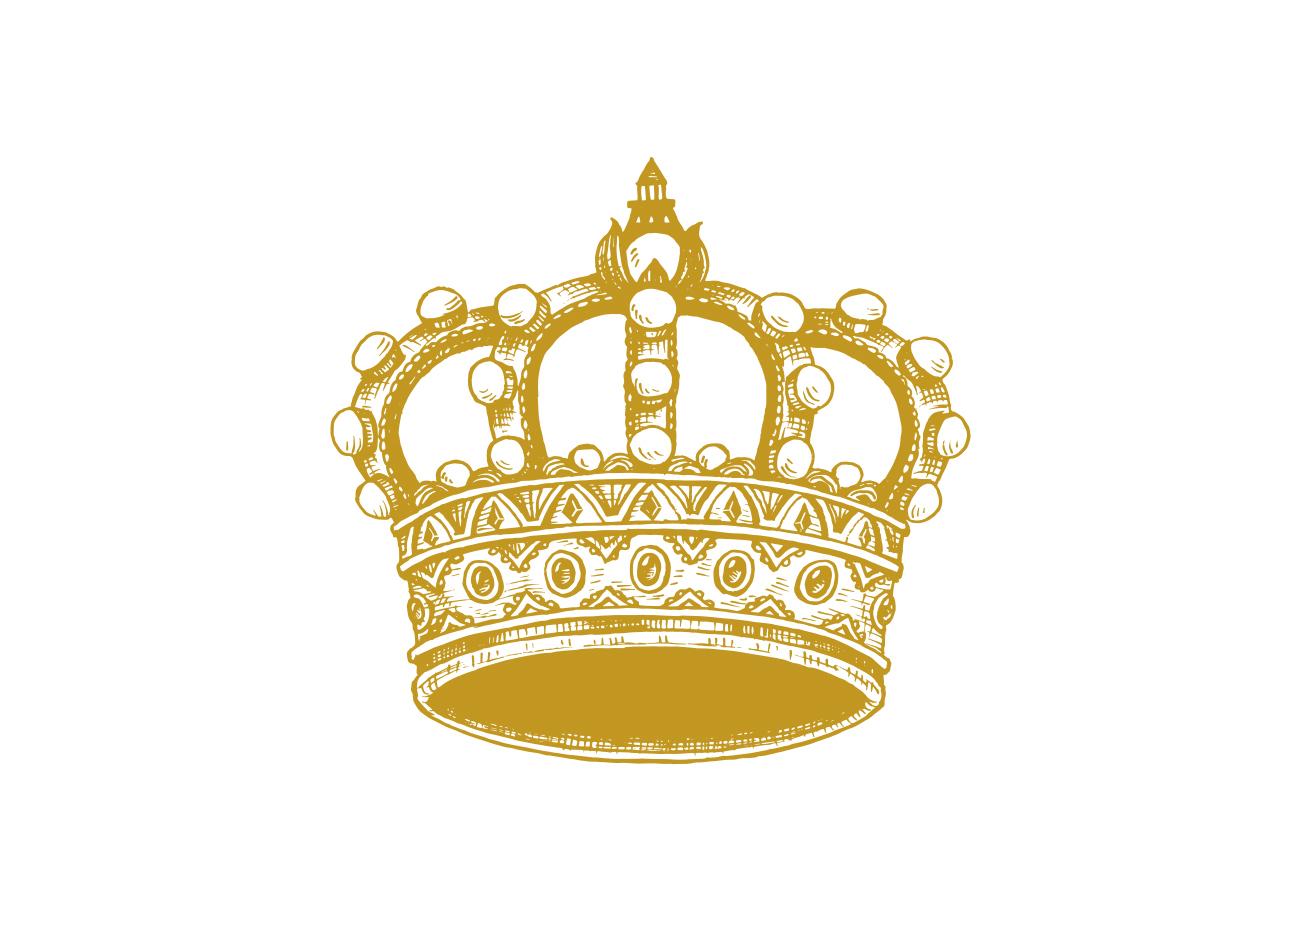 Est.1888_Logos_Gold_Crown.jpg